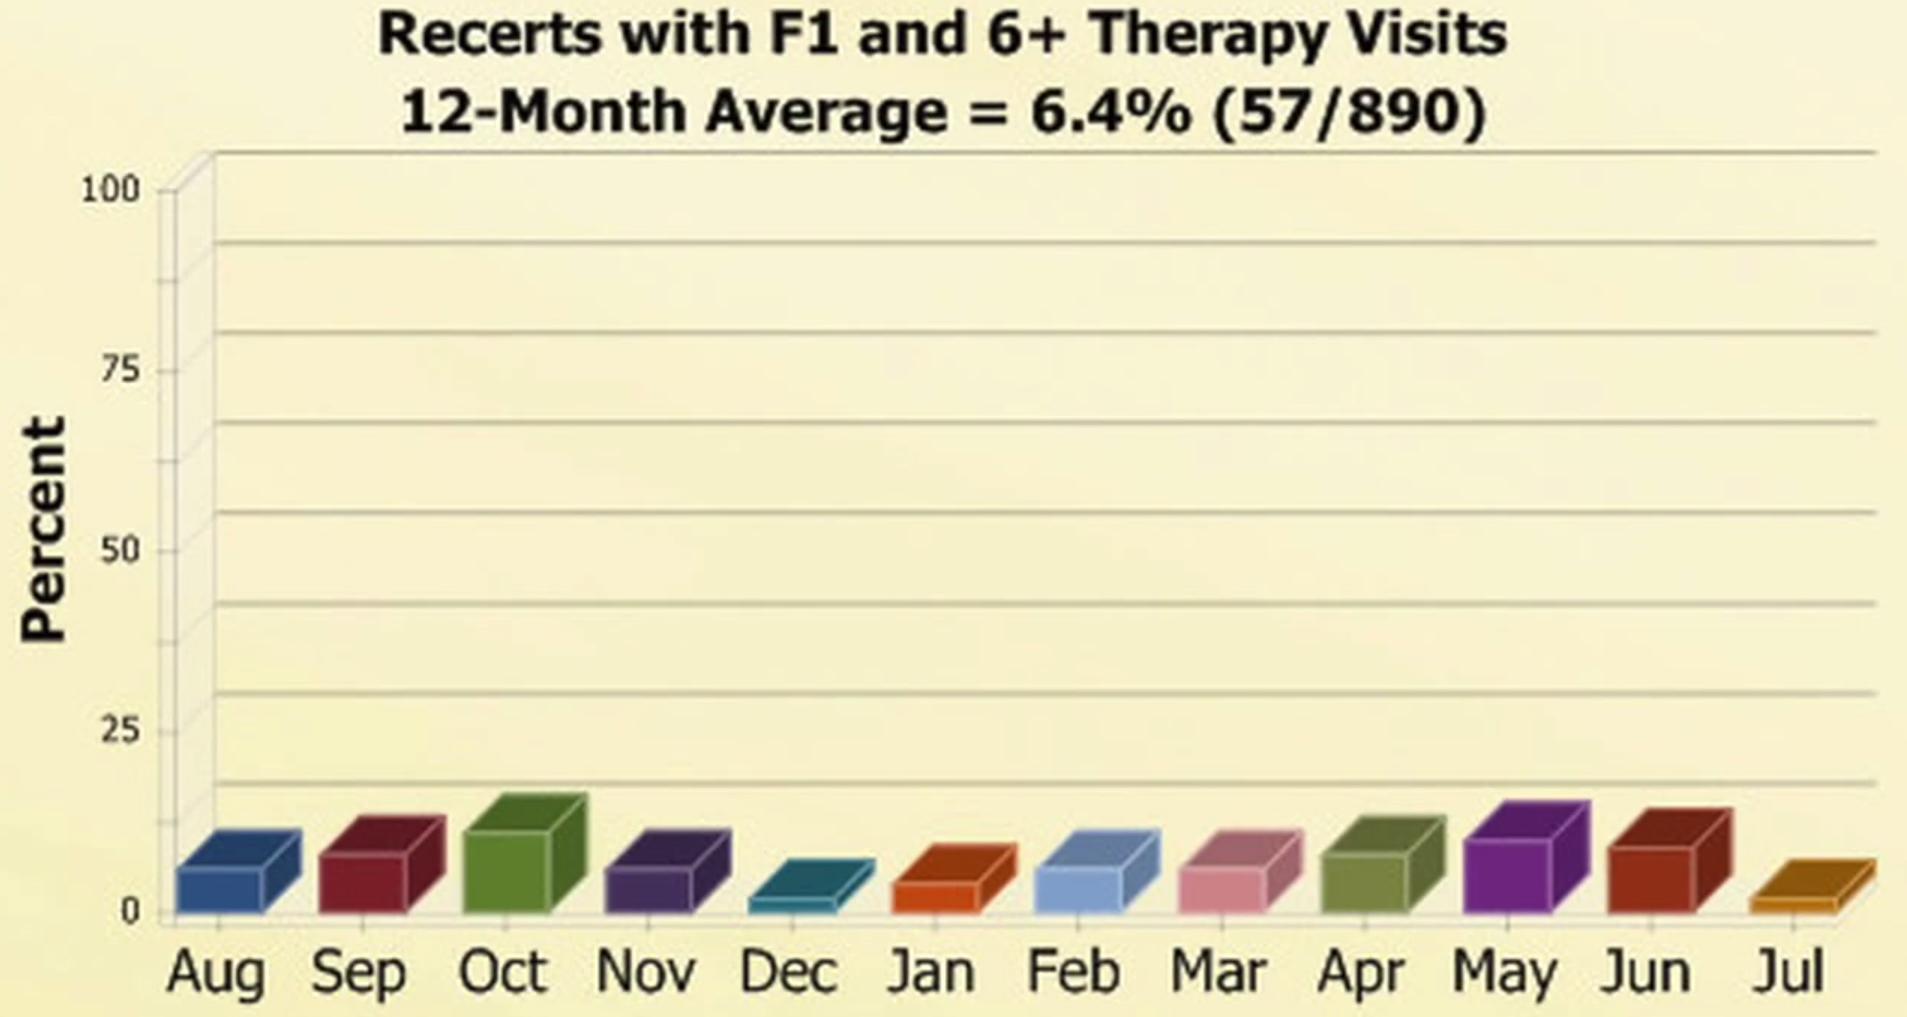 Home Health Gold Software - Data chart